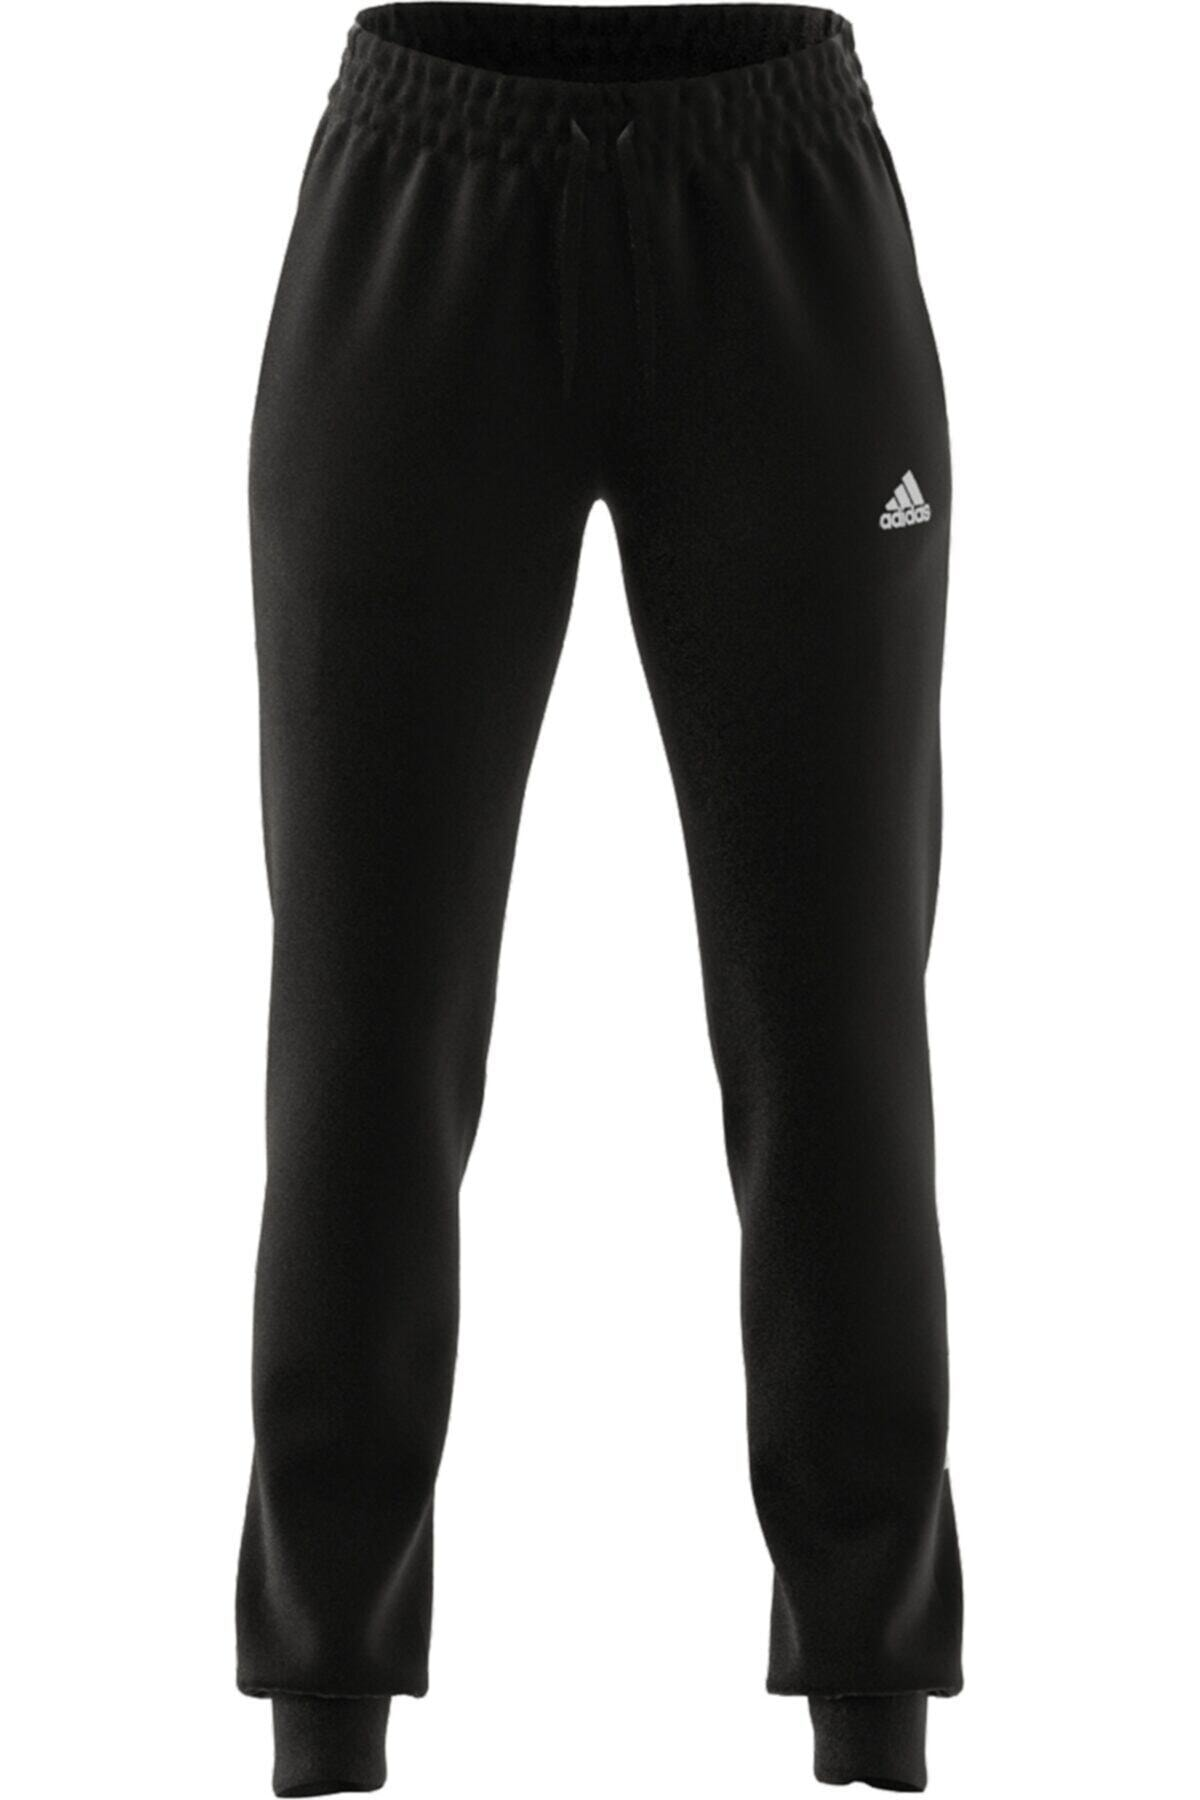 adidas Kadın Siyah Beyaz W Lın Ft C Pt Spor Eşofman Altı 1